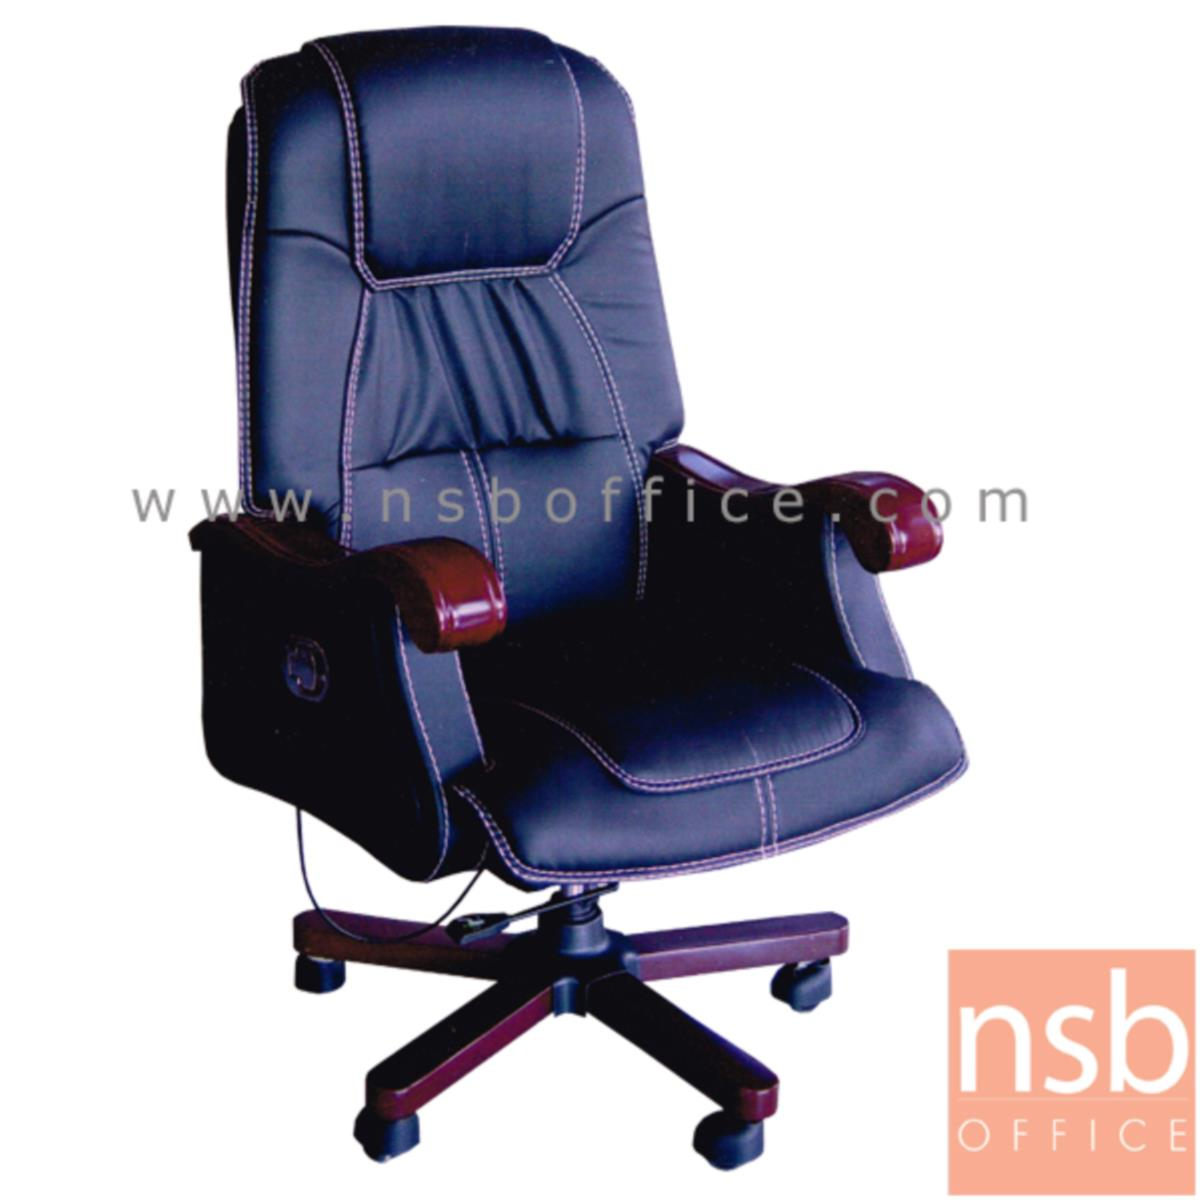 B25A078:เก้าอี้ผู้บริหารหนังเทียม รุ่น Malkovich (มัลโควิช)   โช๊คแก๊ส มีก้อนโยก ขาไม้